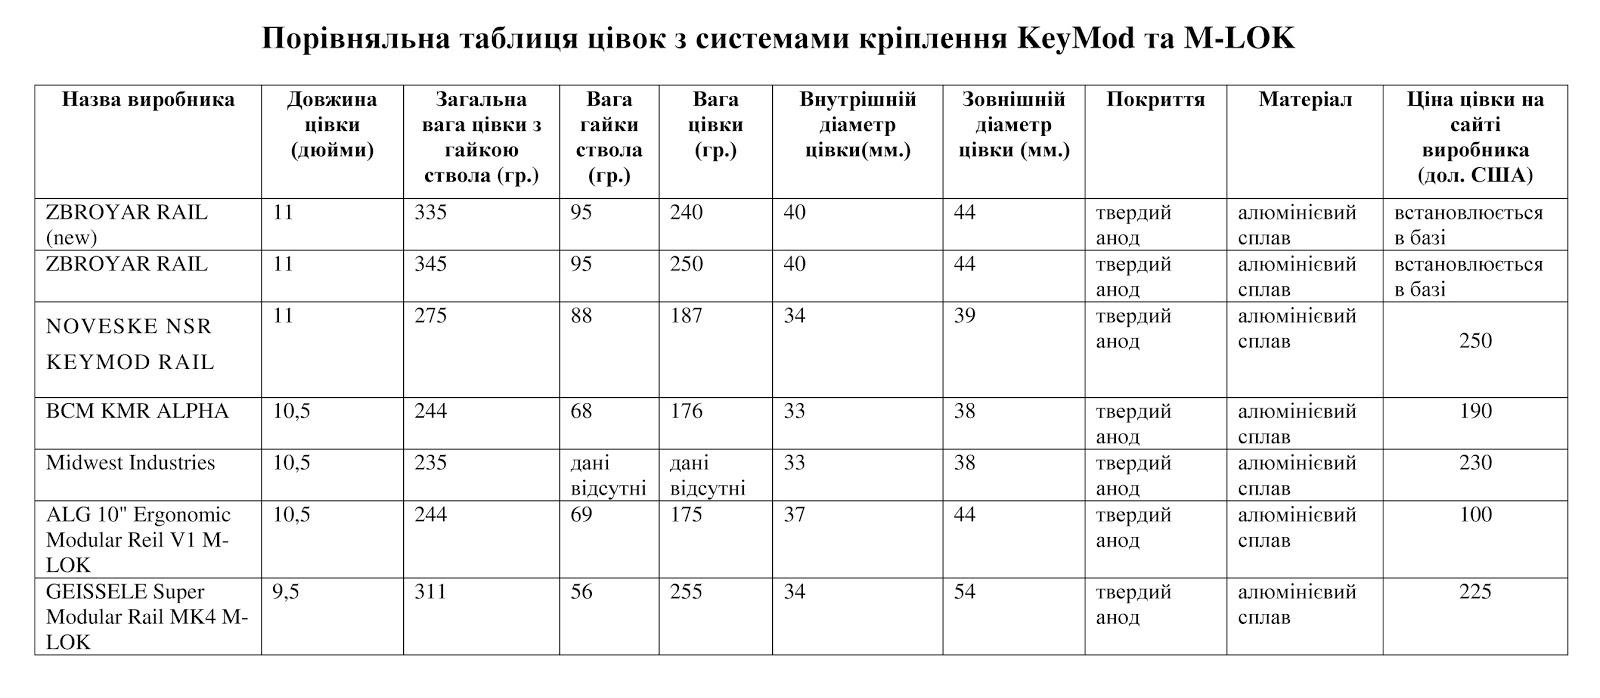 KeyMod ZBROYAR RAIL(new) На Ukrainian Military Pages